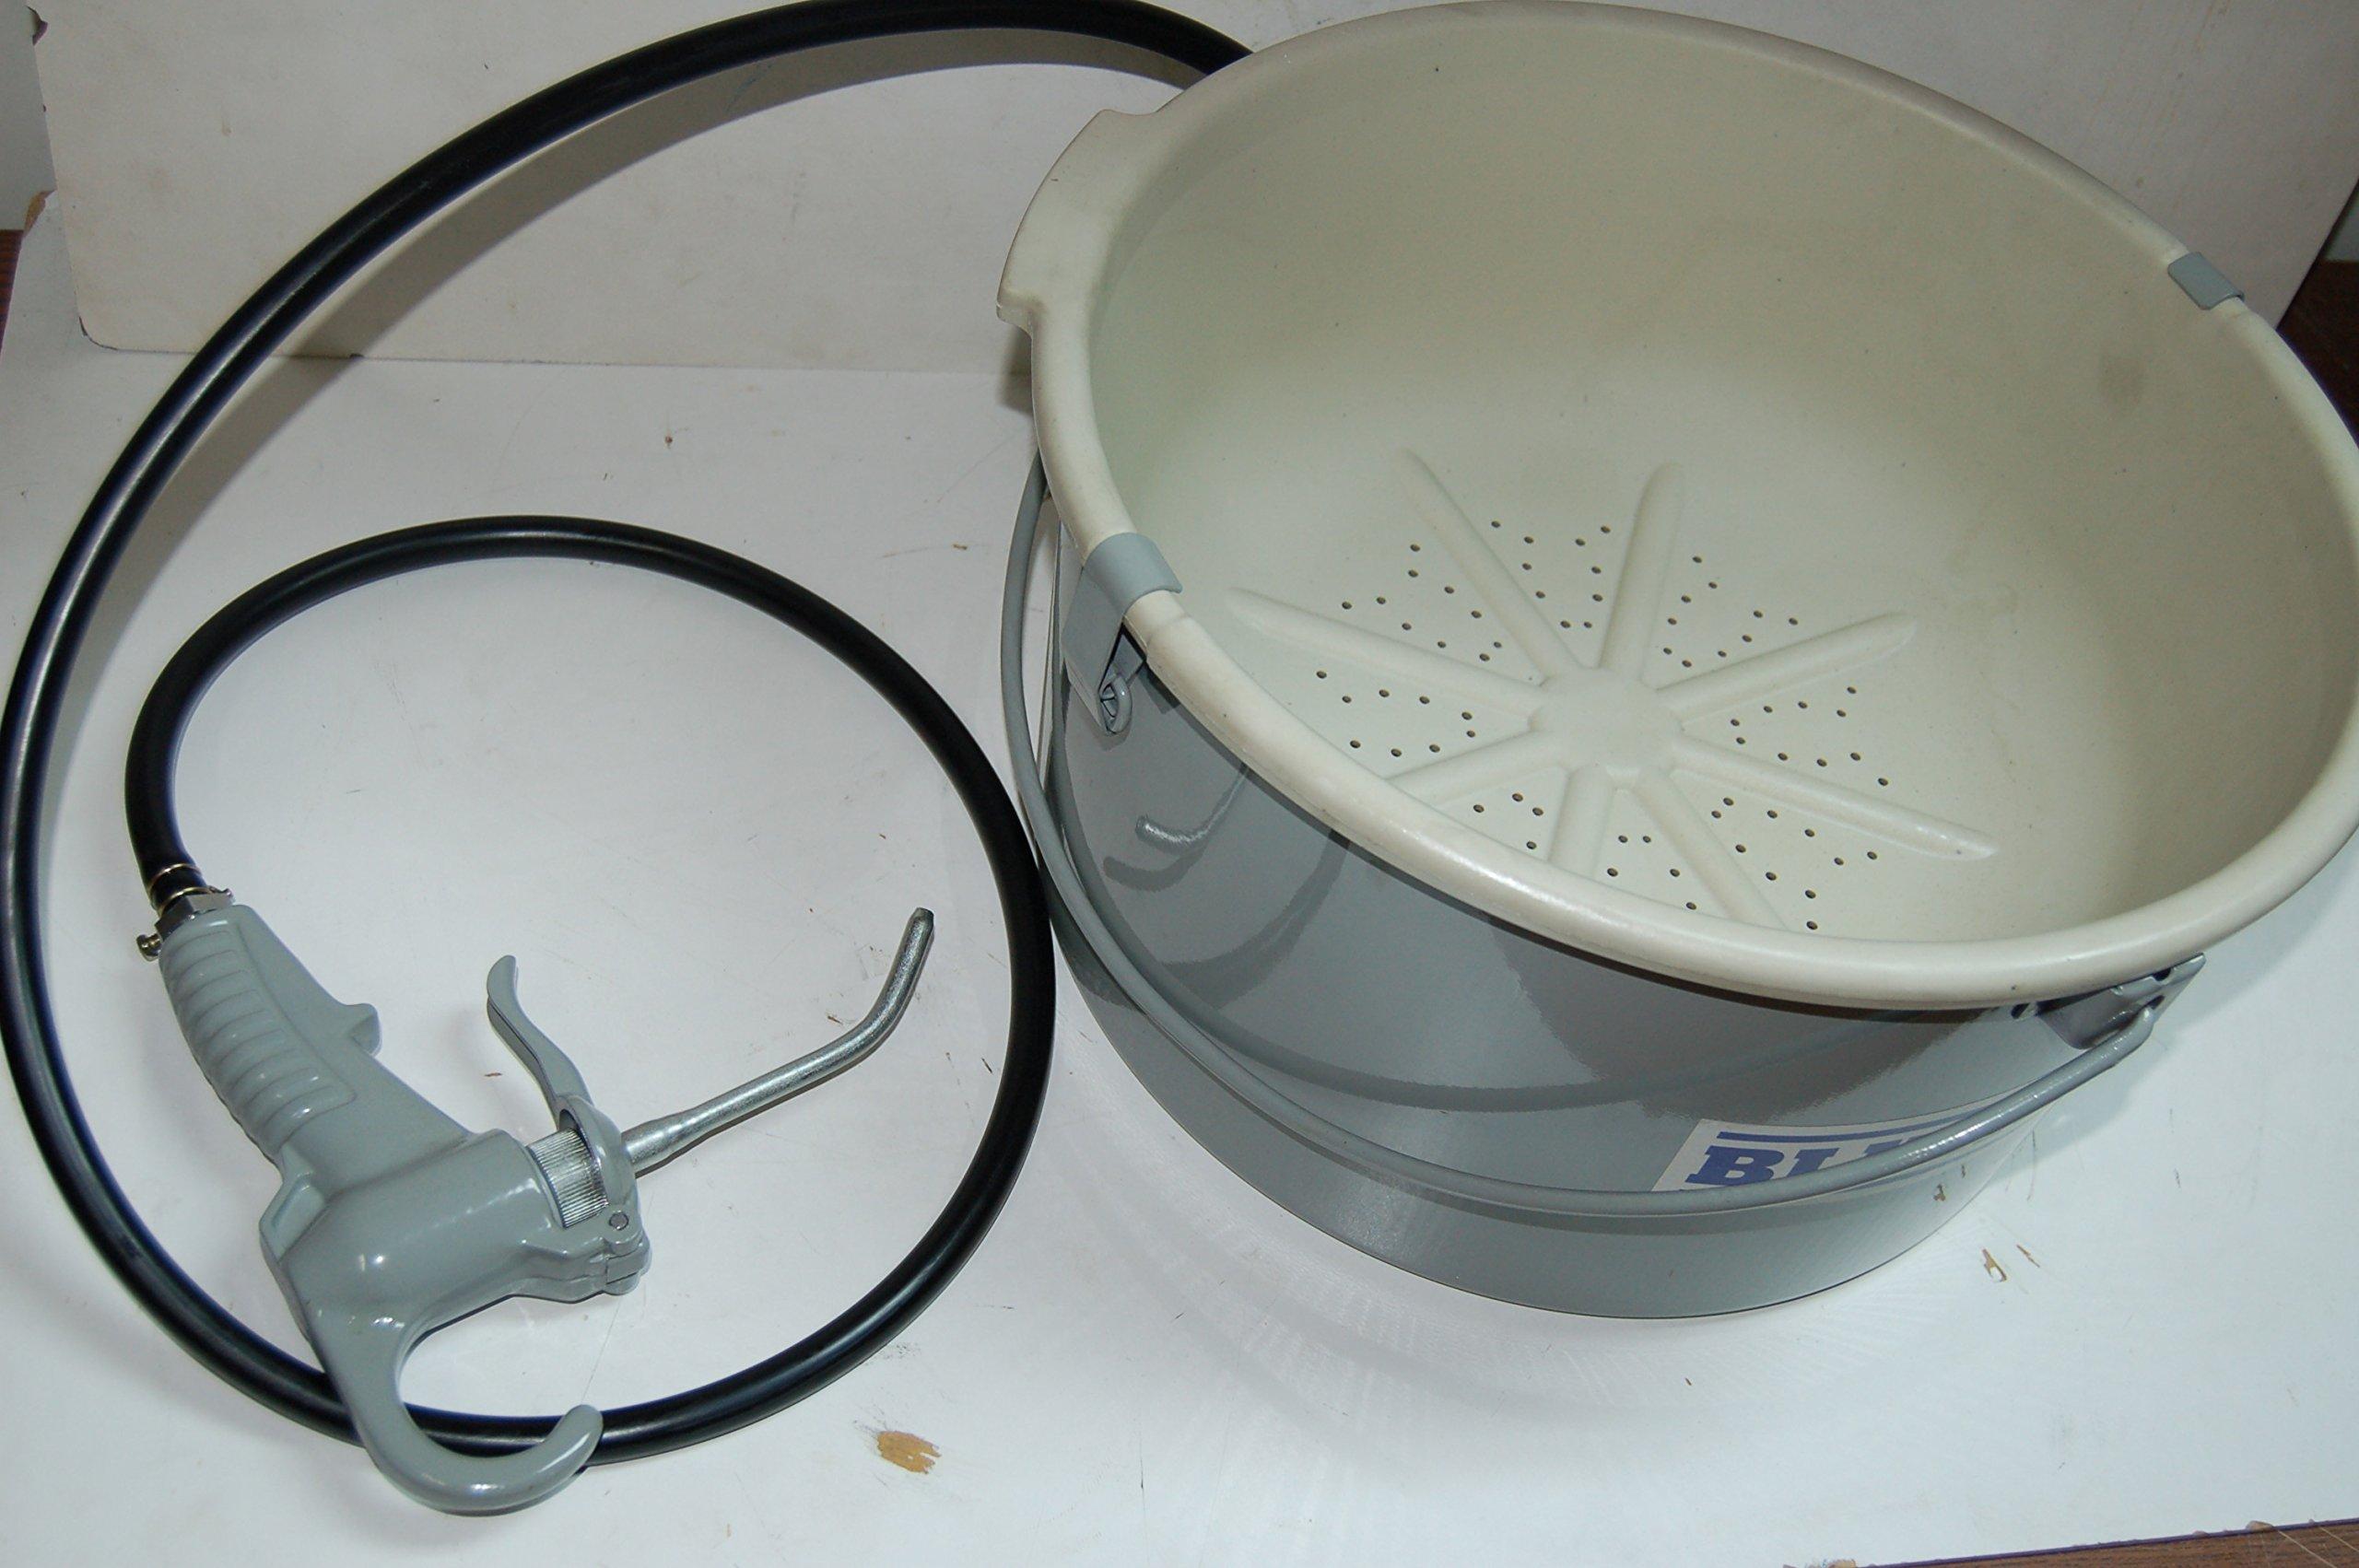 BLUEROCK Tools Hand Held Oiler Bucket for Pipe Threading fits Ridgid 418 300 by BLUEROCK (Image #3)